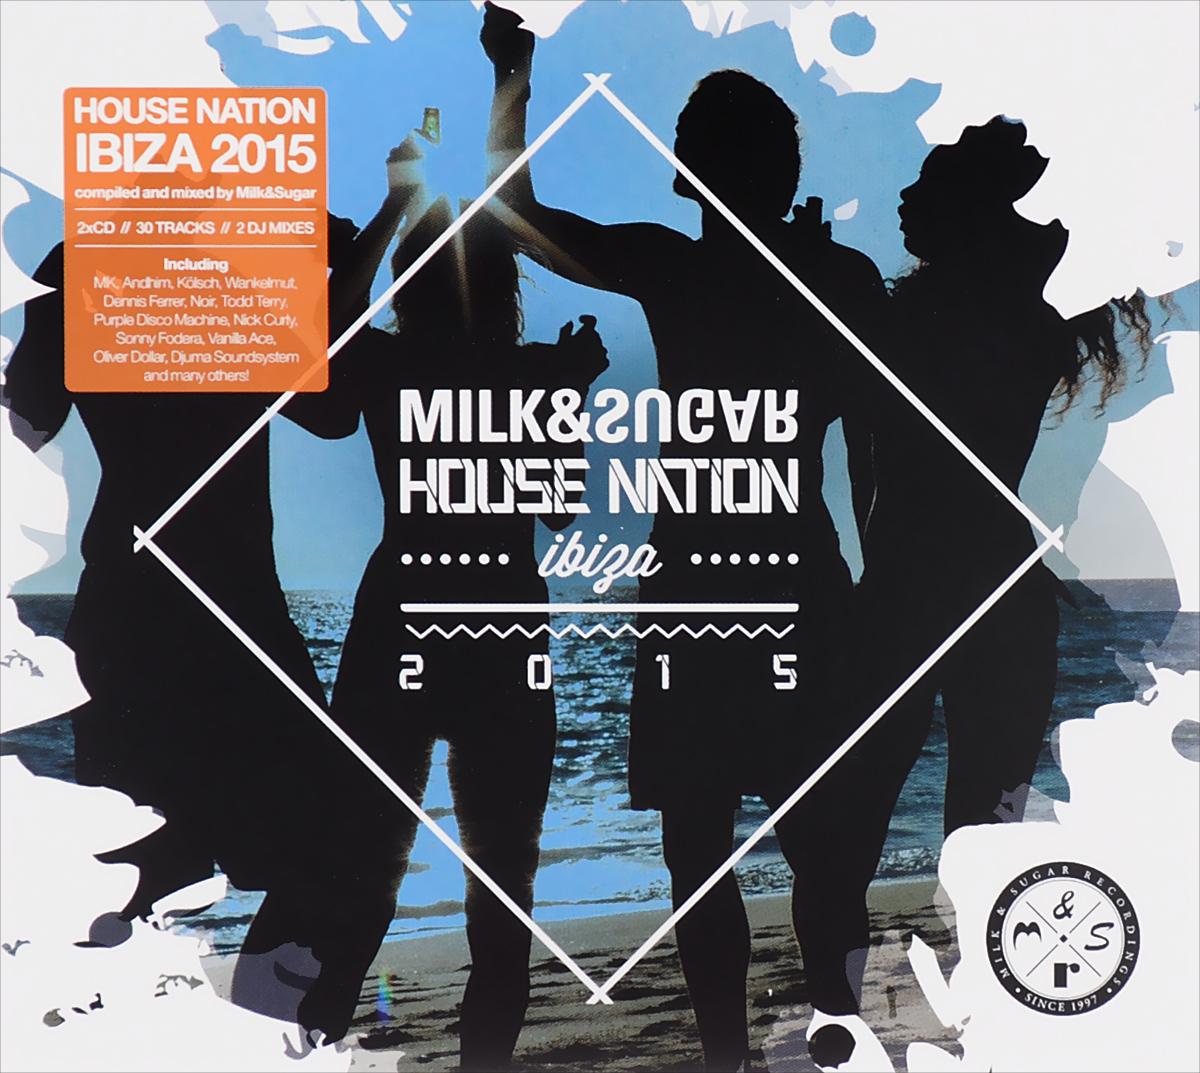 Milk & Sugar. House Nation Ibiza 2015 (2 CD) 2 Audio CD